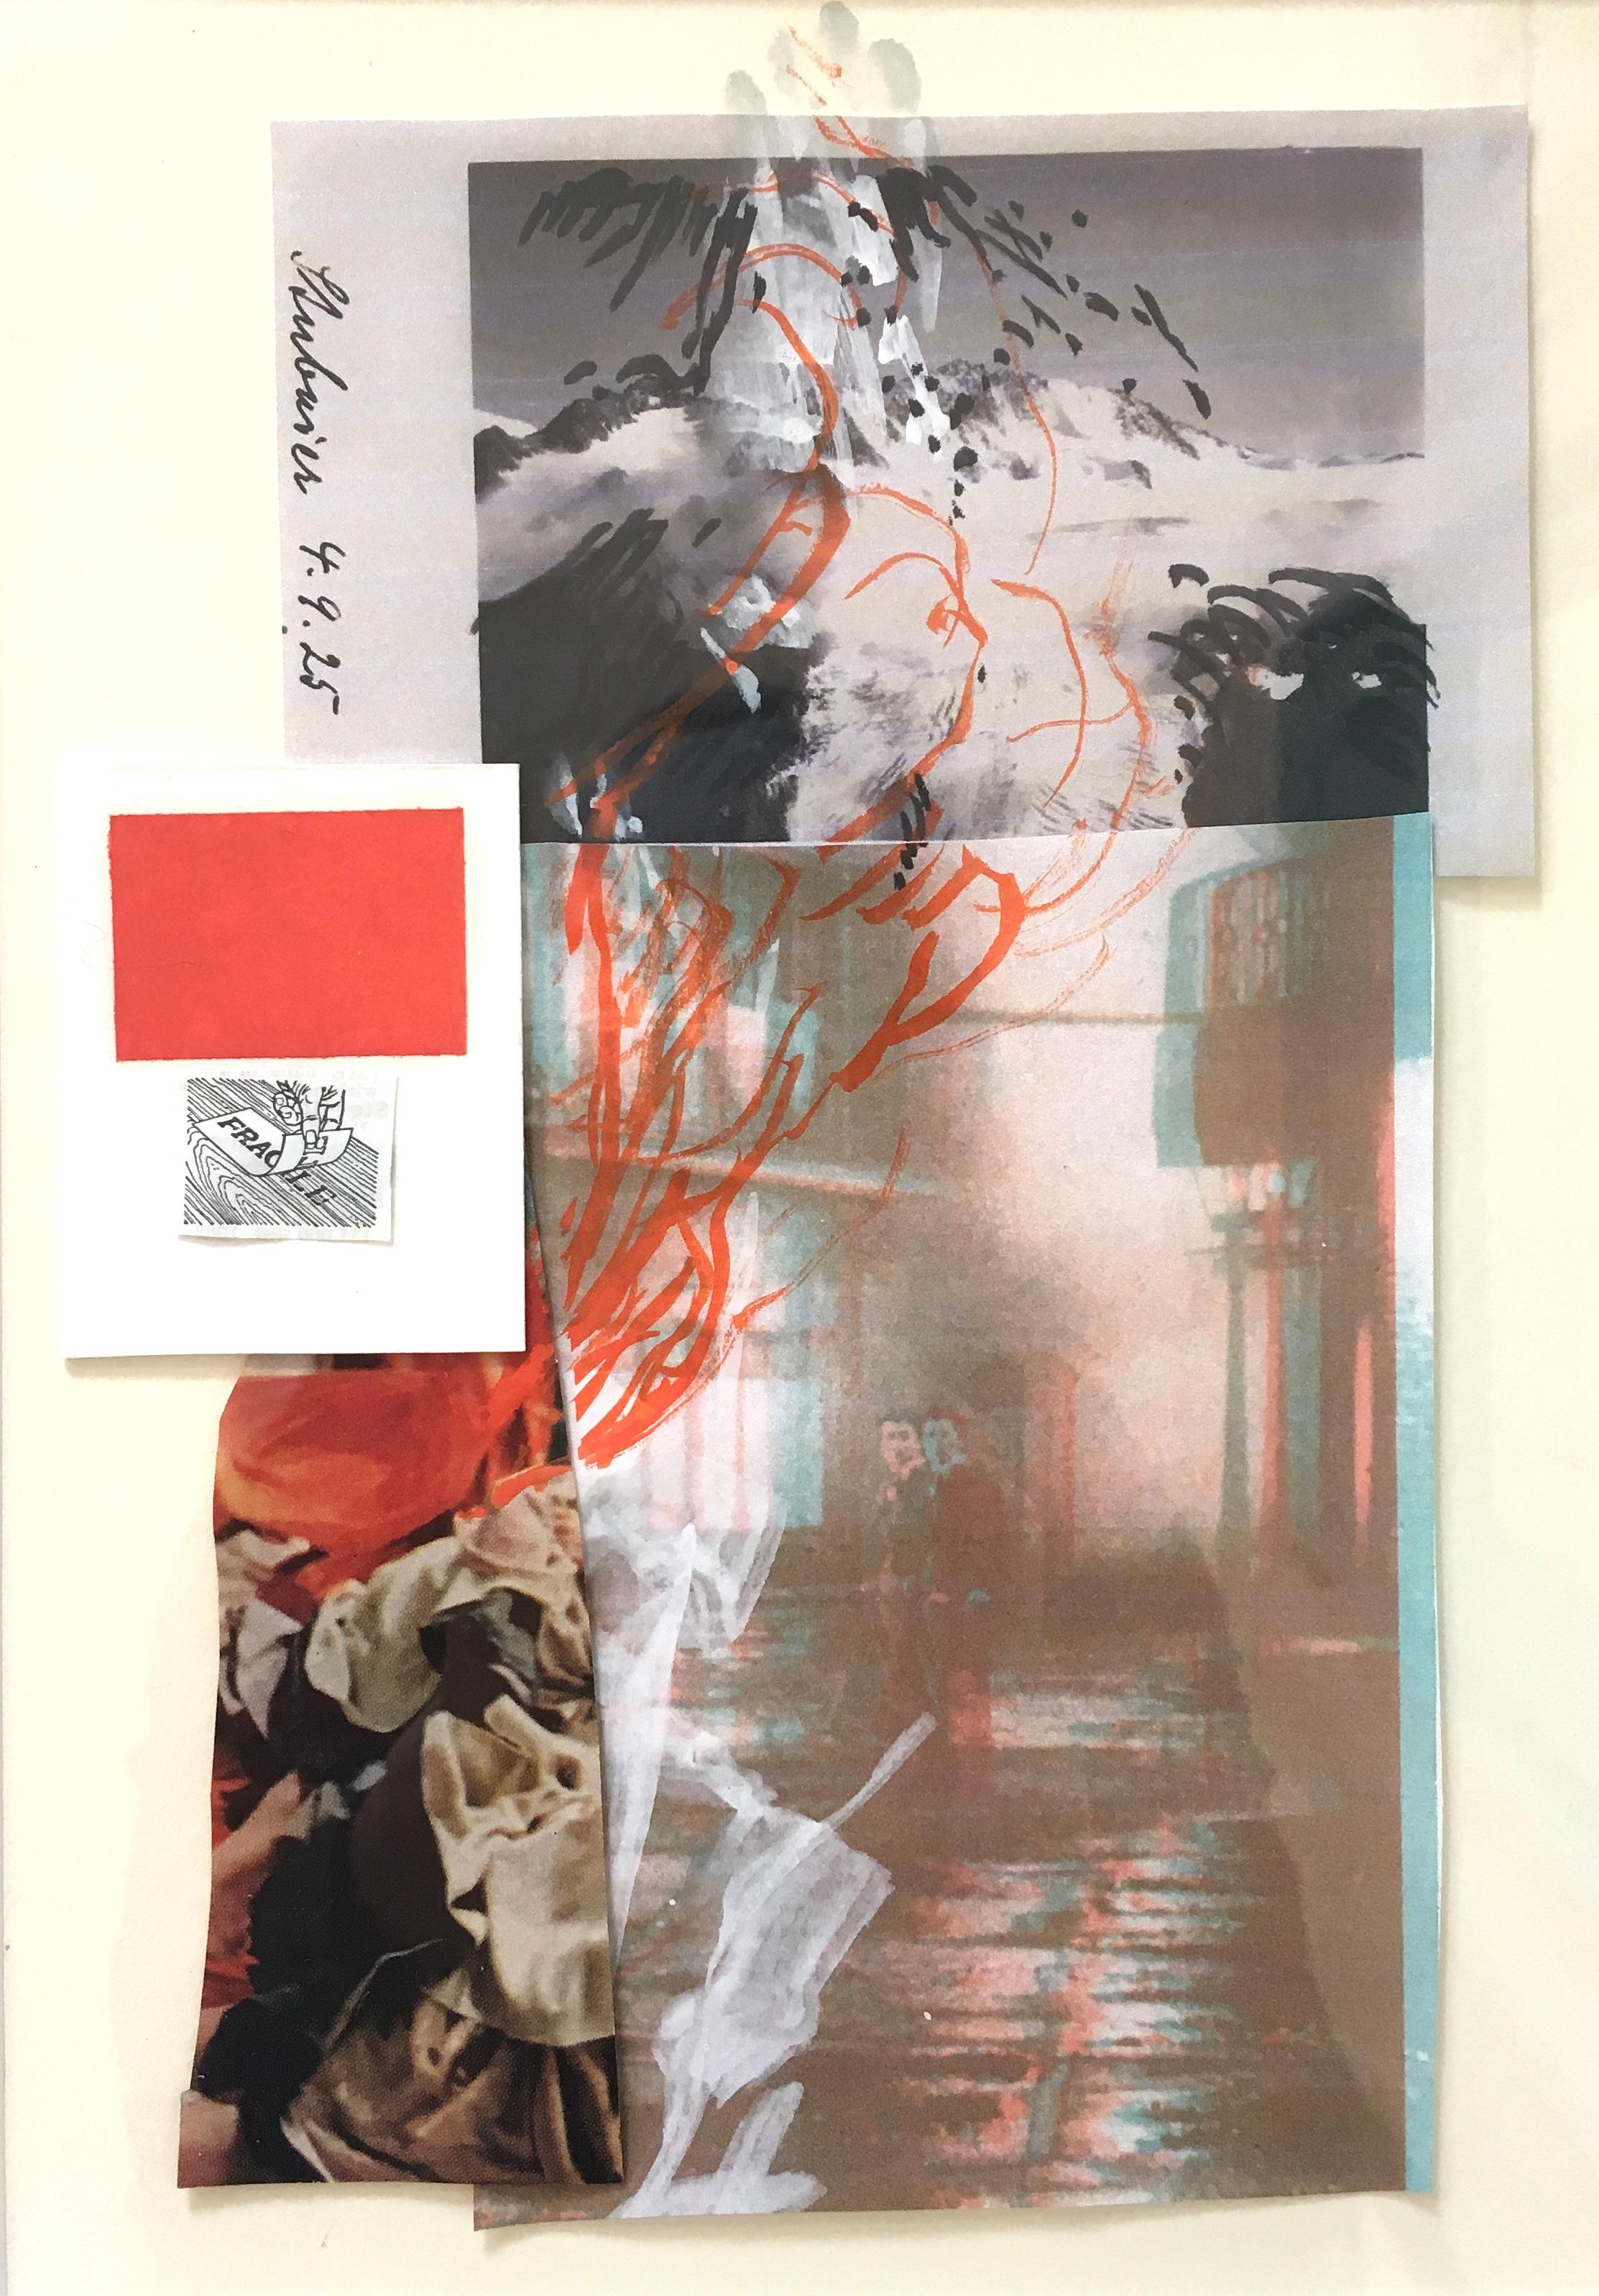 fragile_smoke_collage.jpg